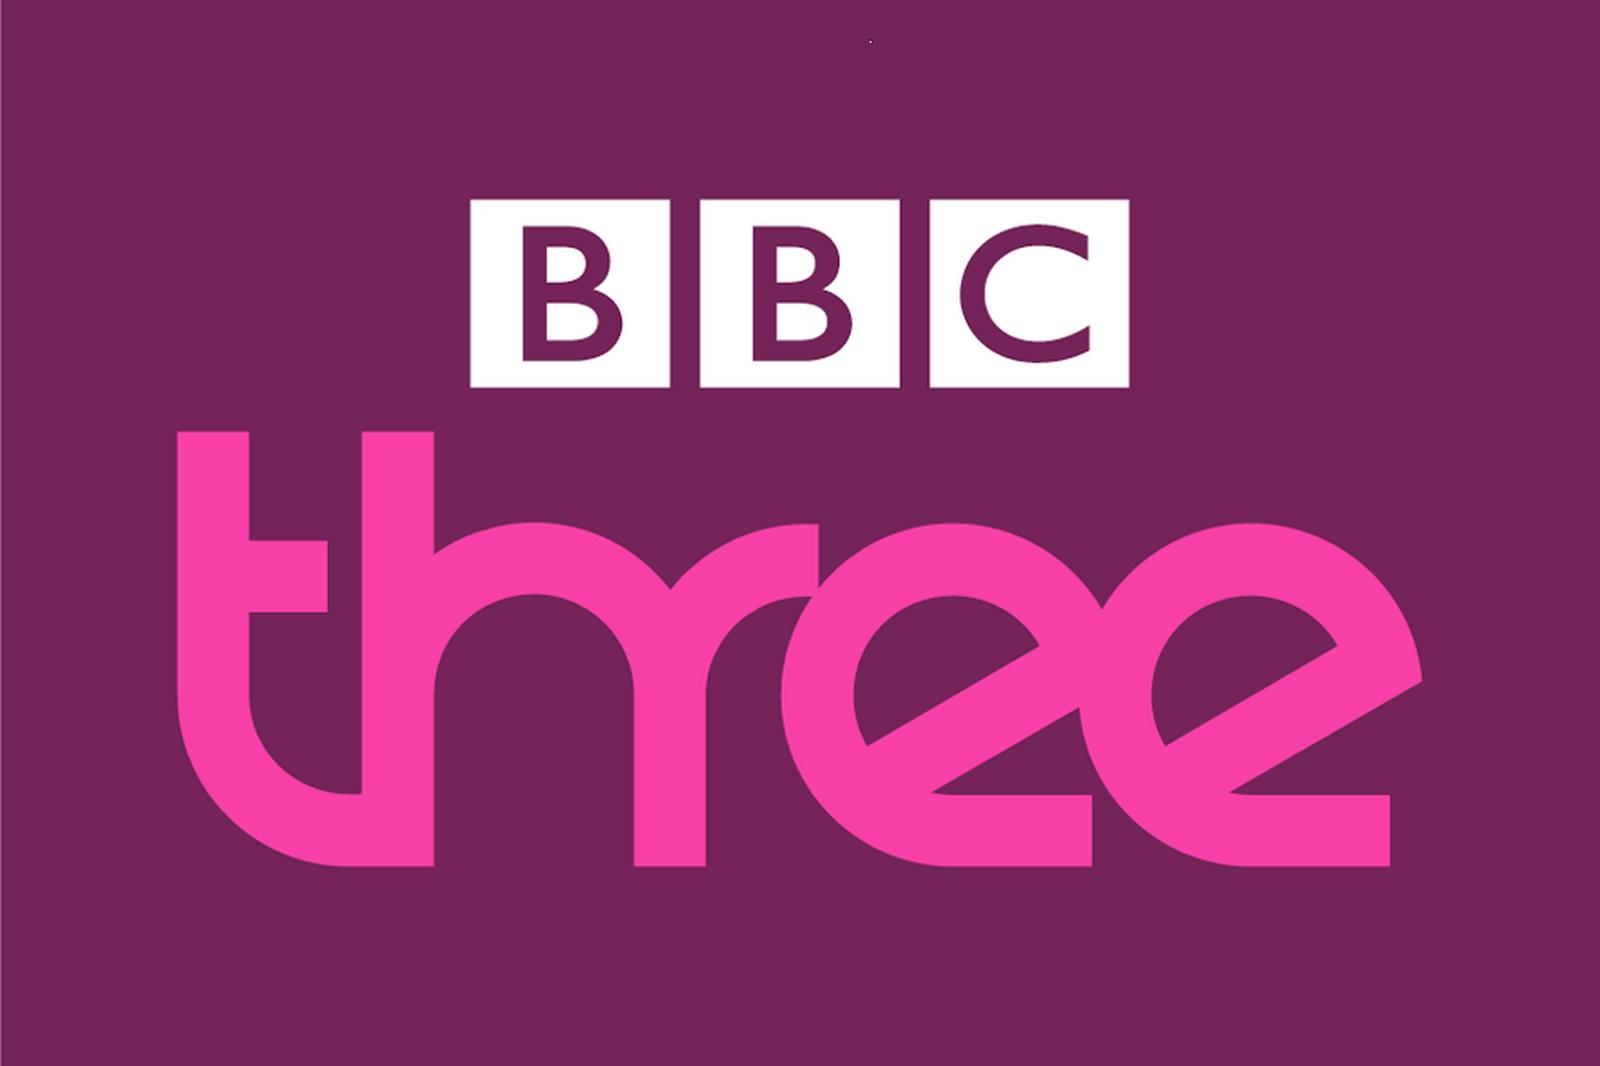 BBC Three HD TV Channel Bbc three, Tv channel logo